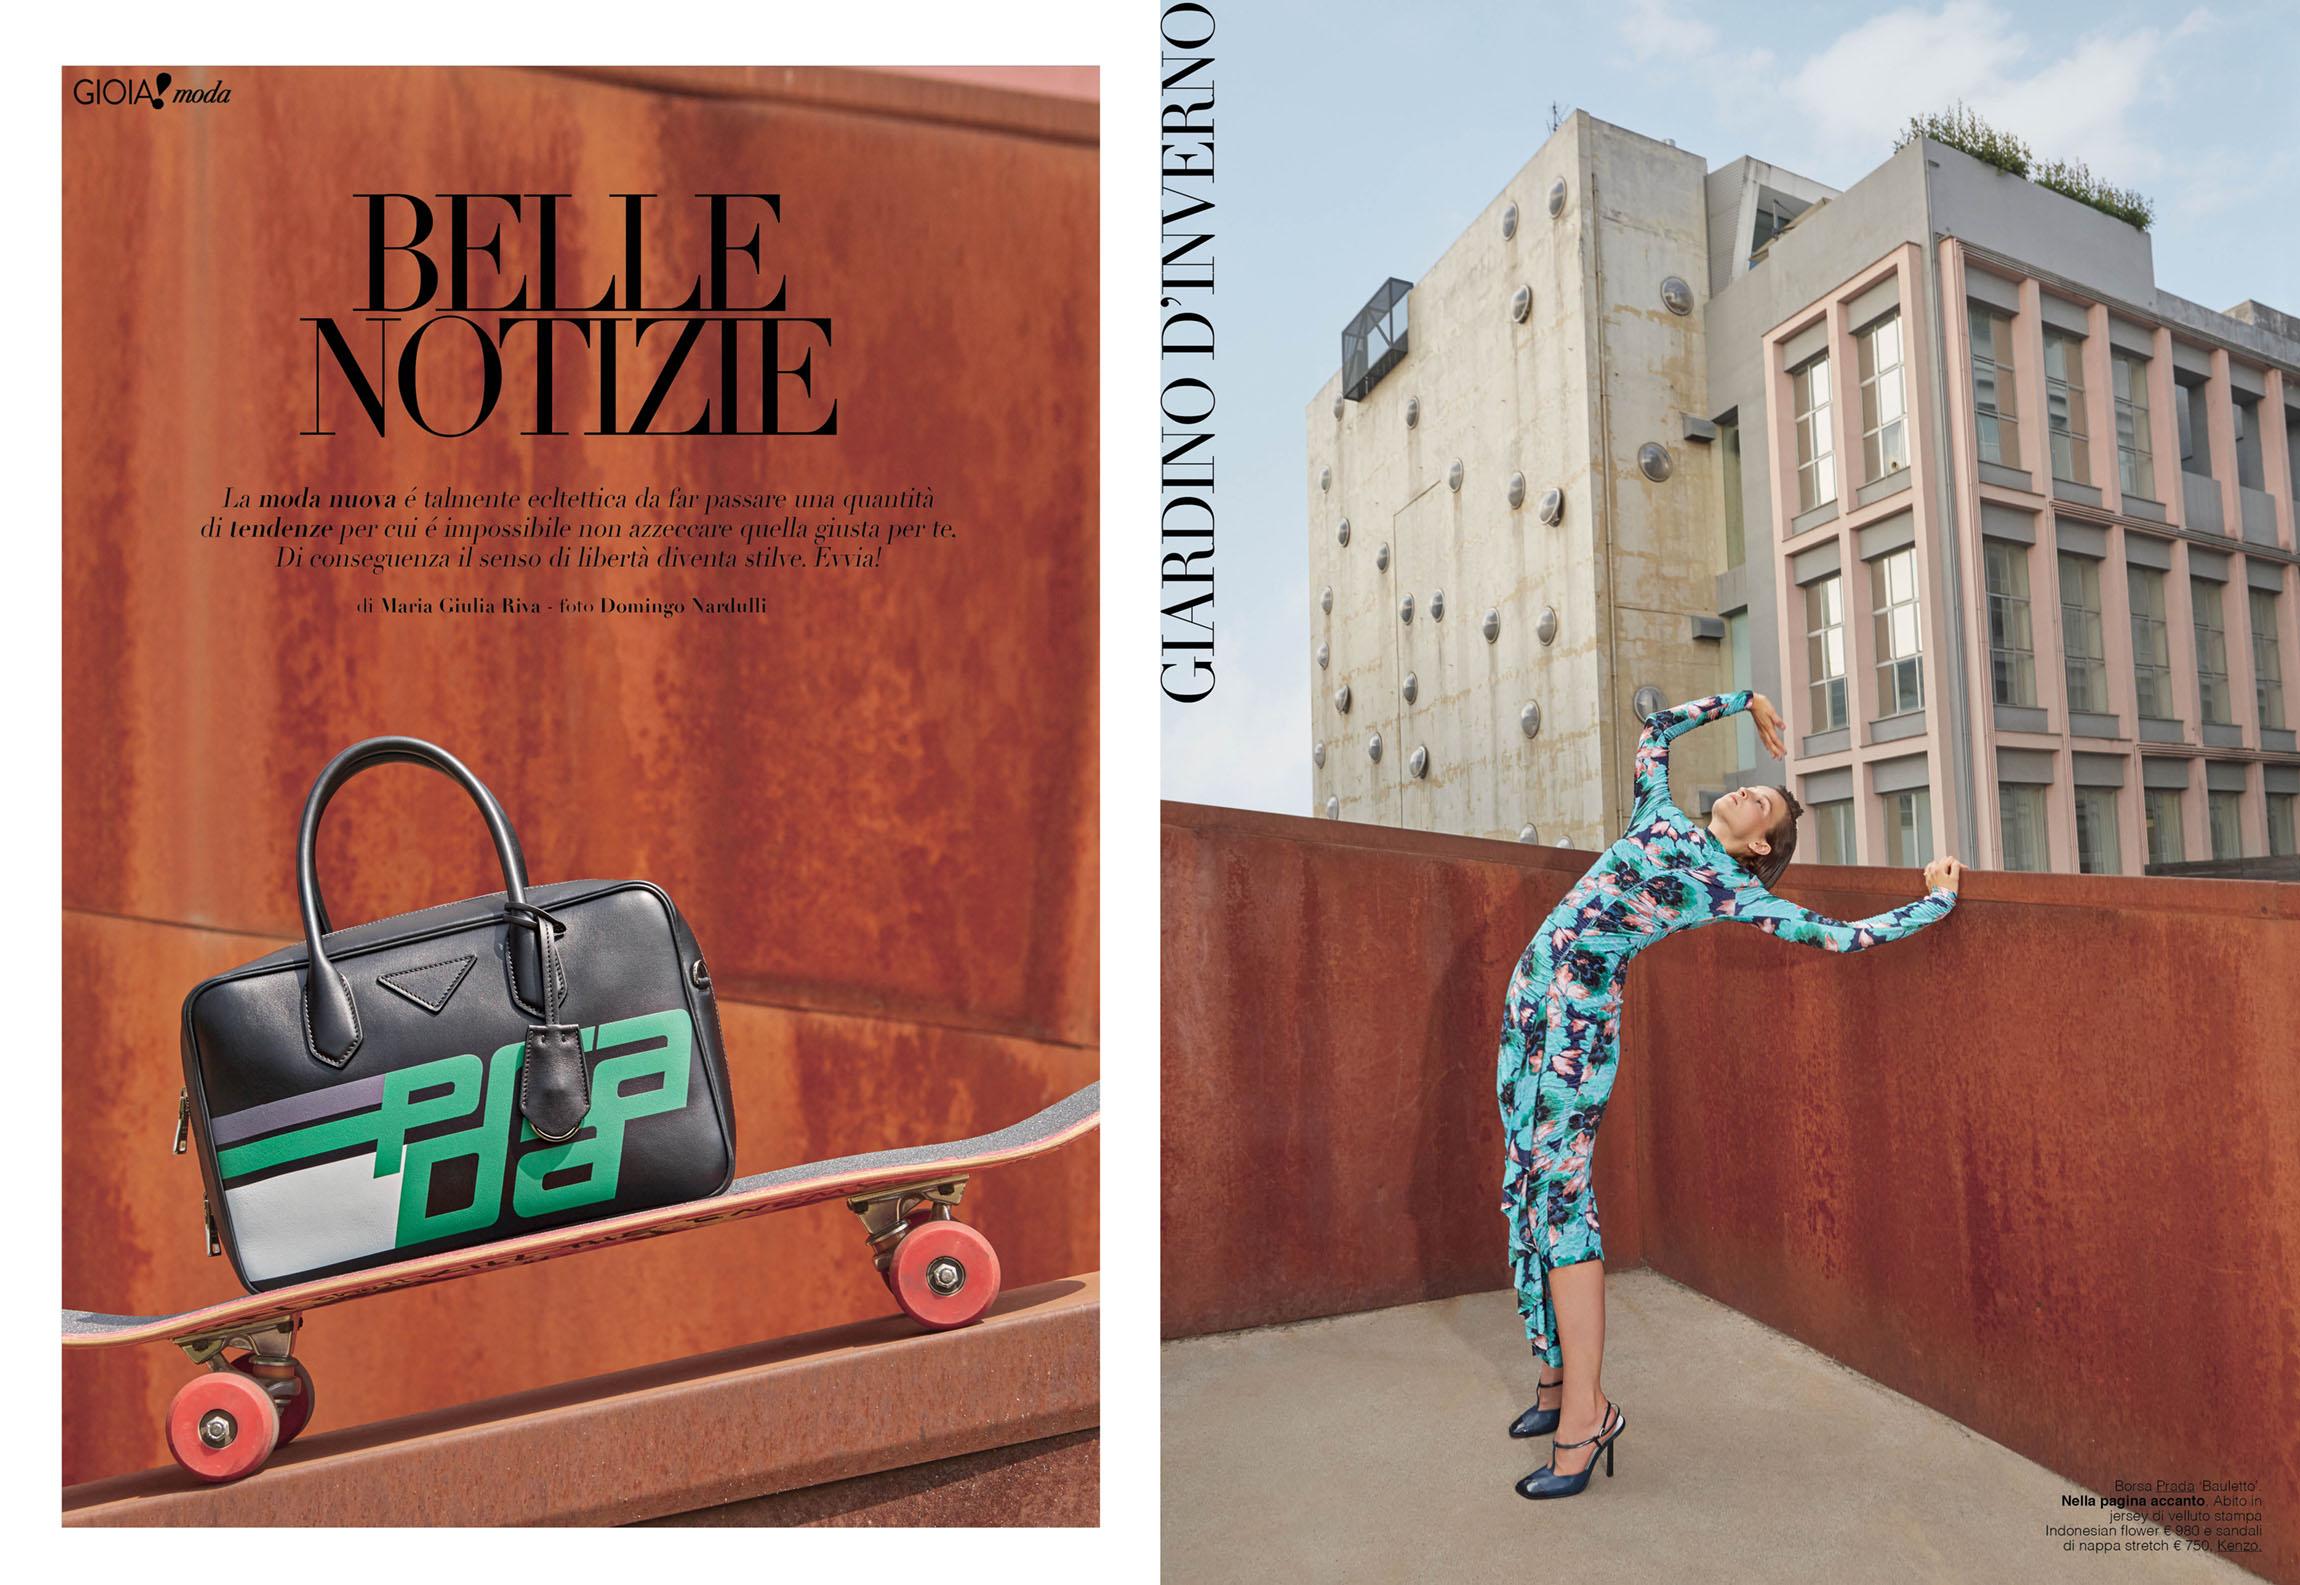 Gioia magazine August 2018 | Domingo Nardulli | Blazé Milano | Gioia | Maria Giulia Riva | Numerique Retouch Photo Retouching Studio